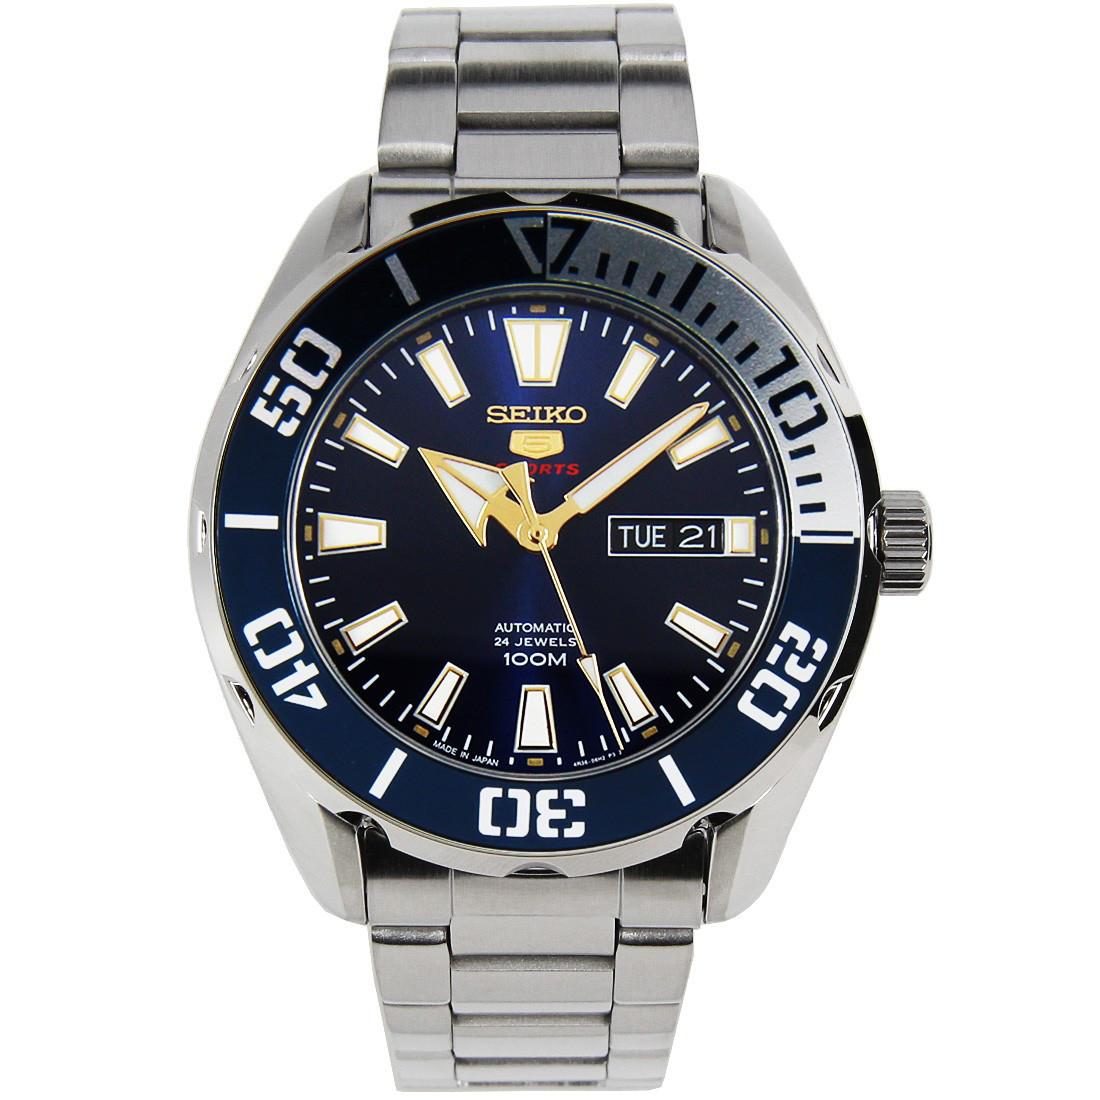 Часы Seiko 5 Sports SRPC51J1 Automatic 4R36